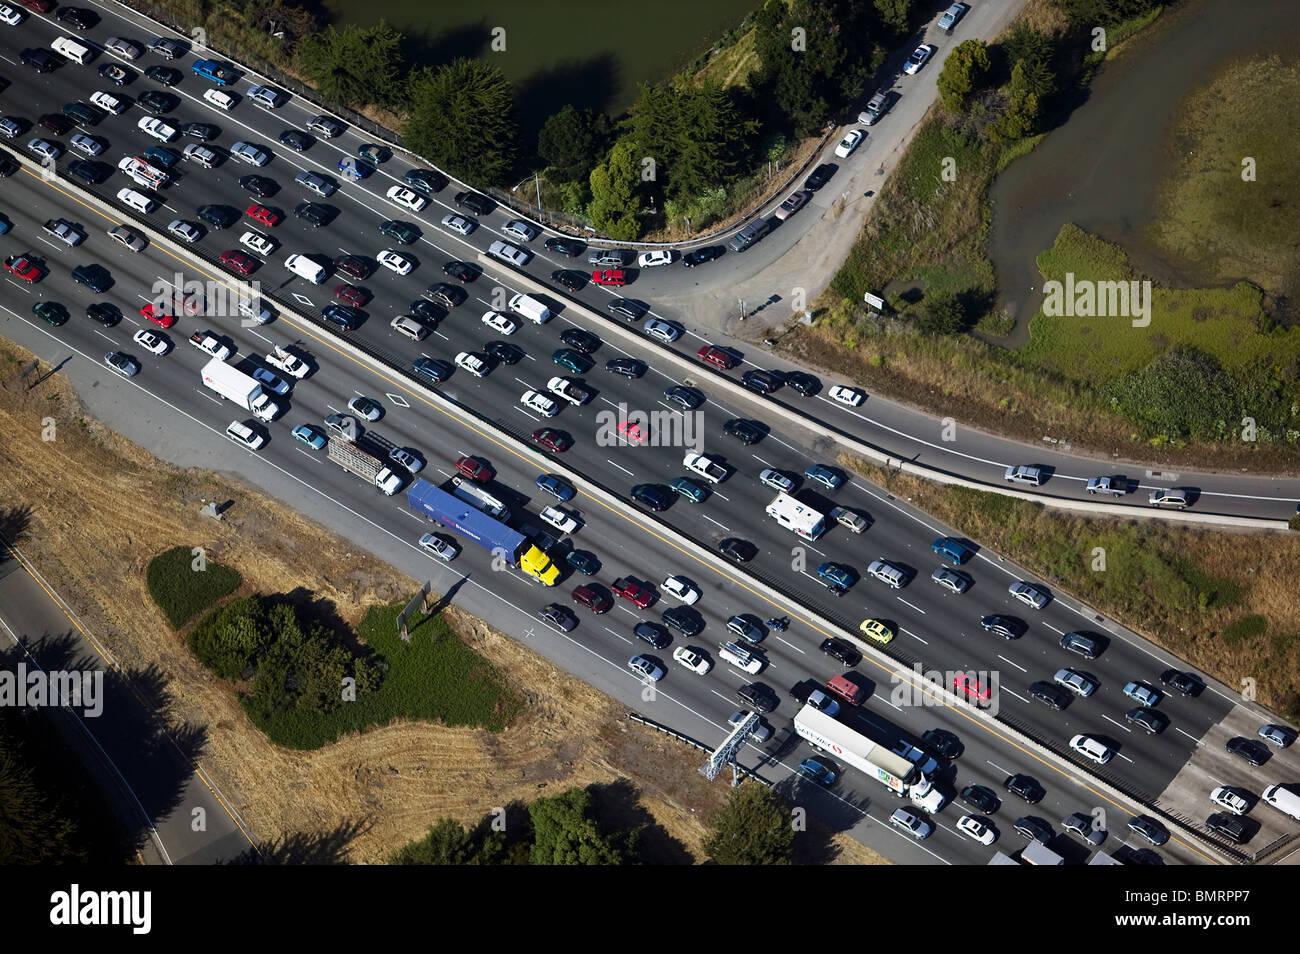 Luftaufnahme über Traffic jam interstate 80 Emeryville Berkeley California Stockbild